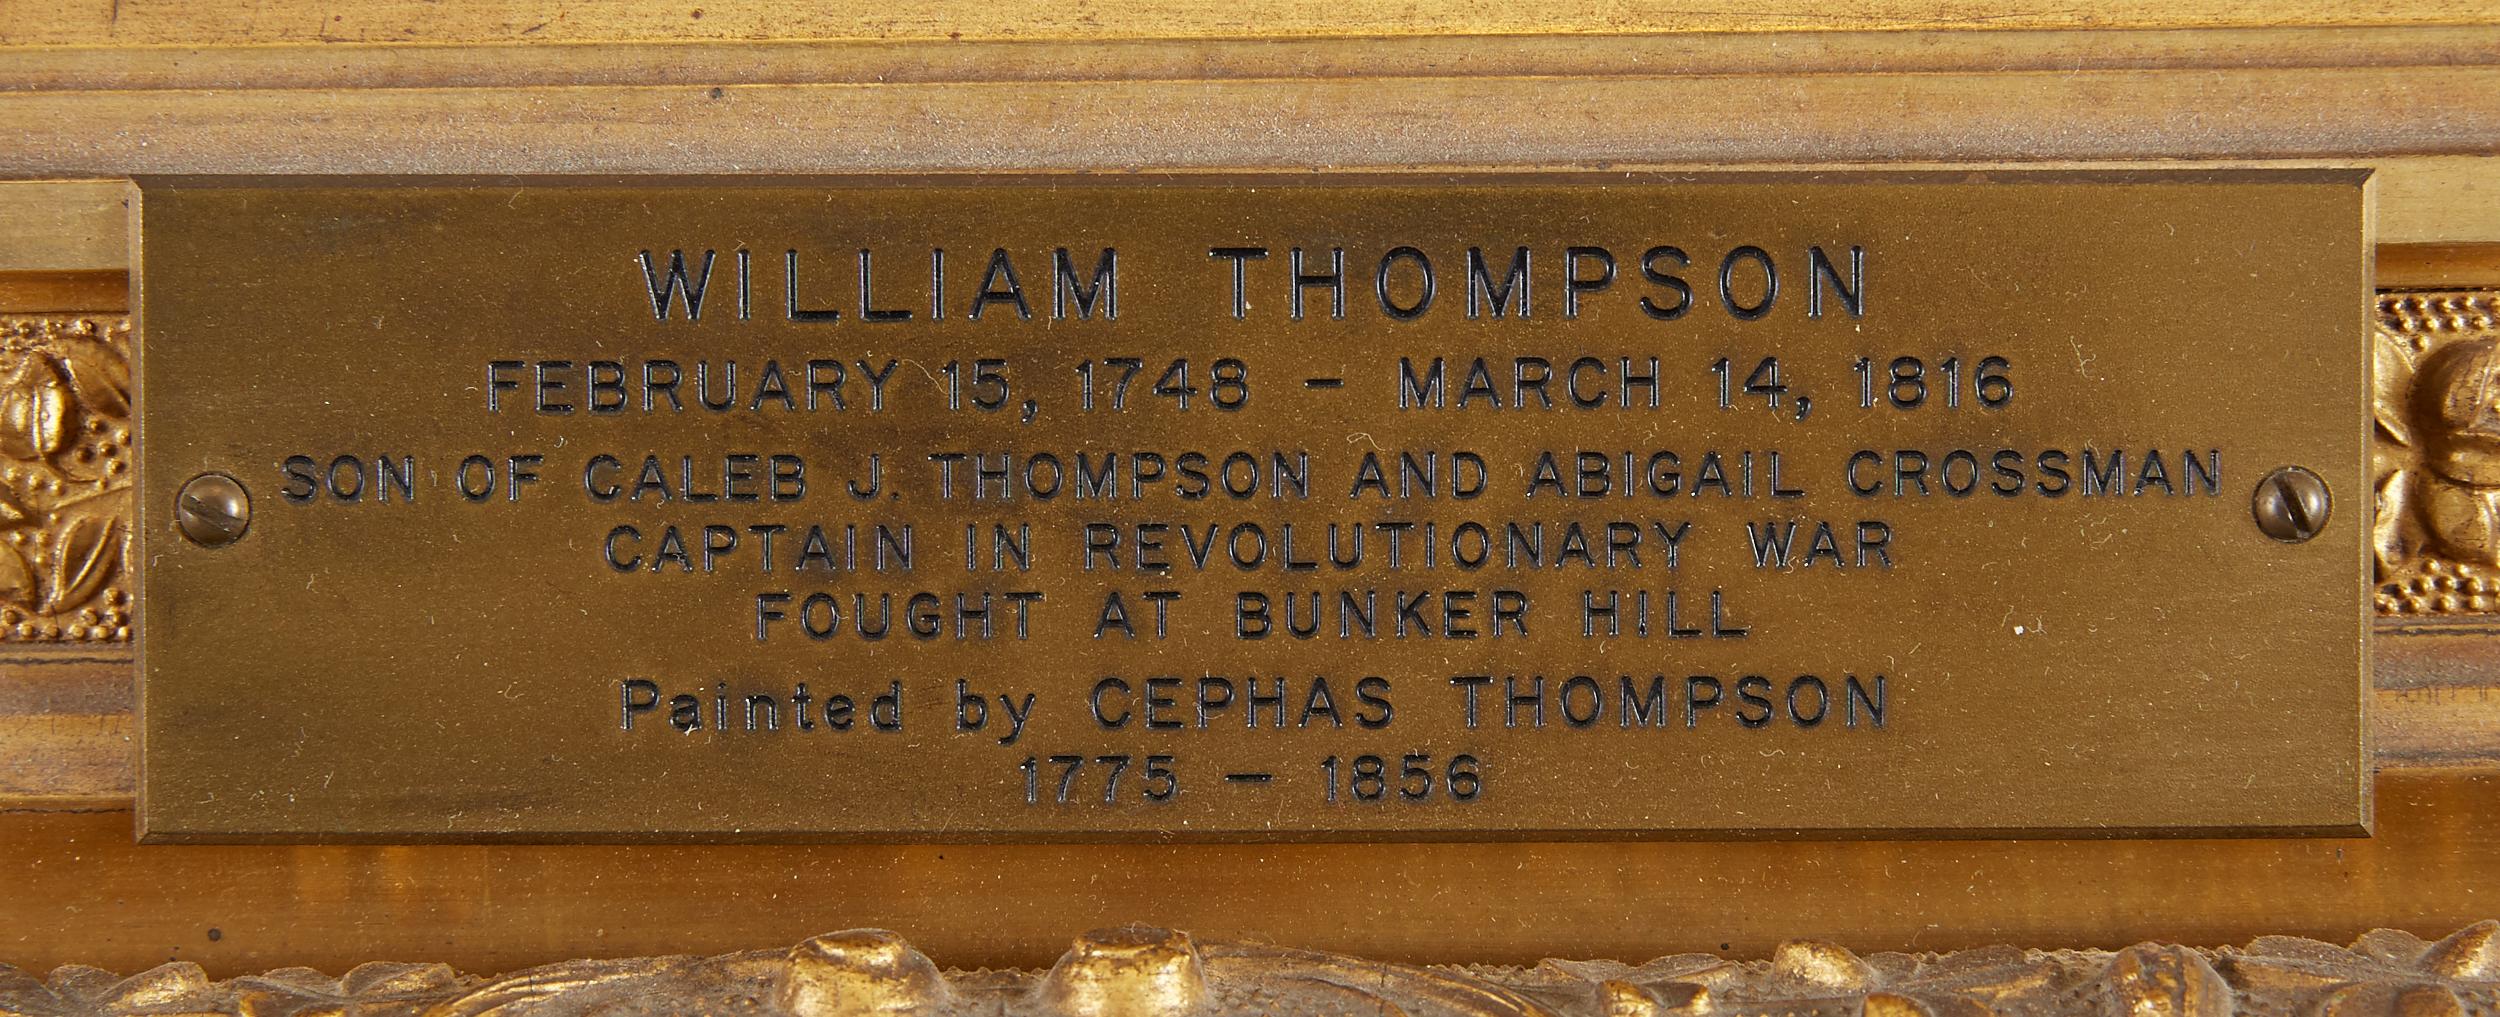 Lot 11 - Cephas Thompson Portrait of William Thompson